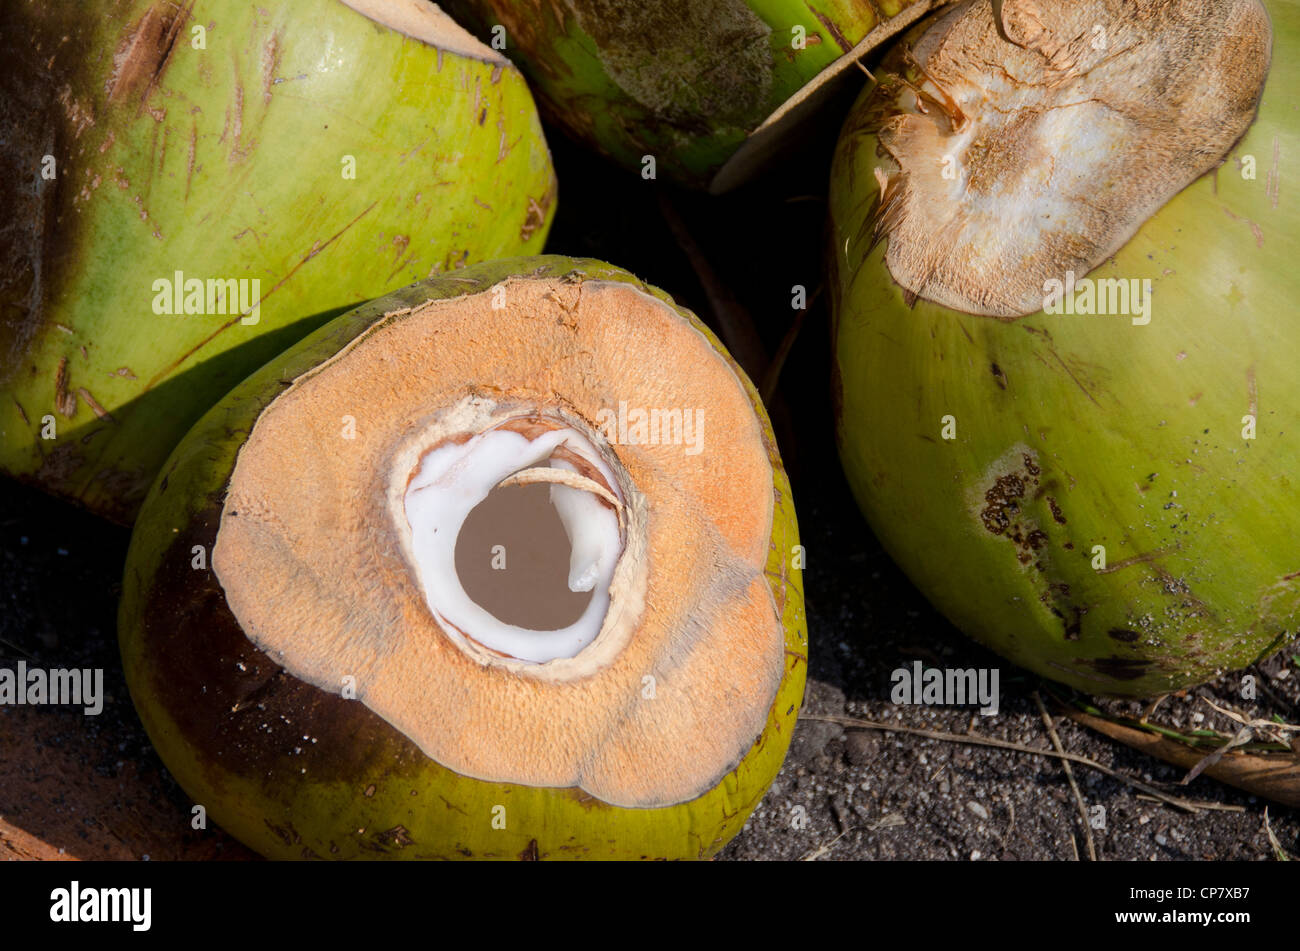 Thailand, Island of Ko Samui (aka Koh Samui). Coconut plantation. Stock Photo